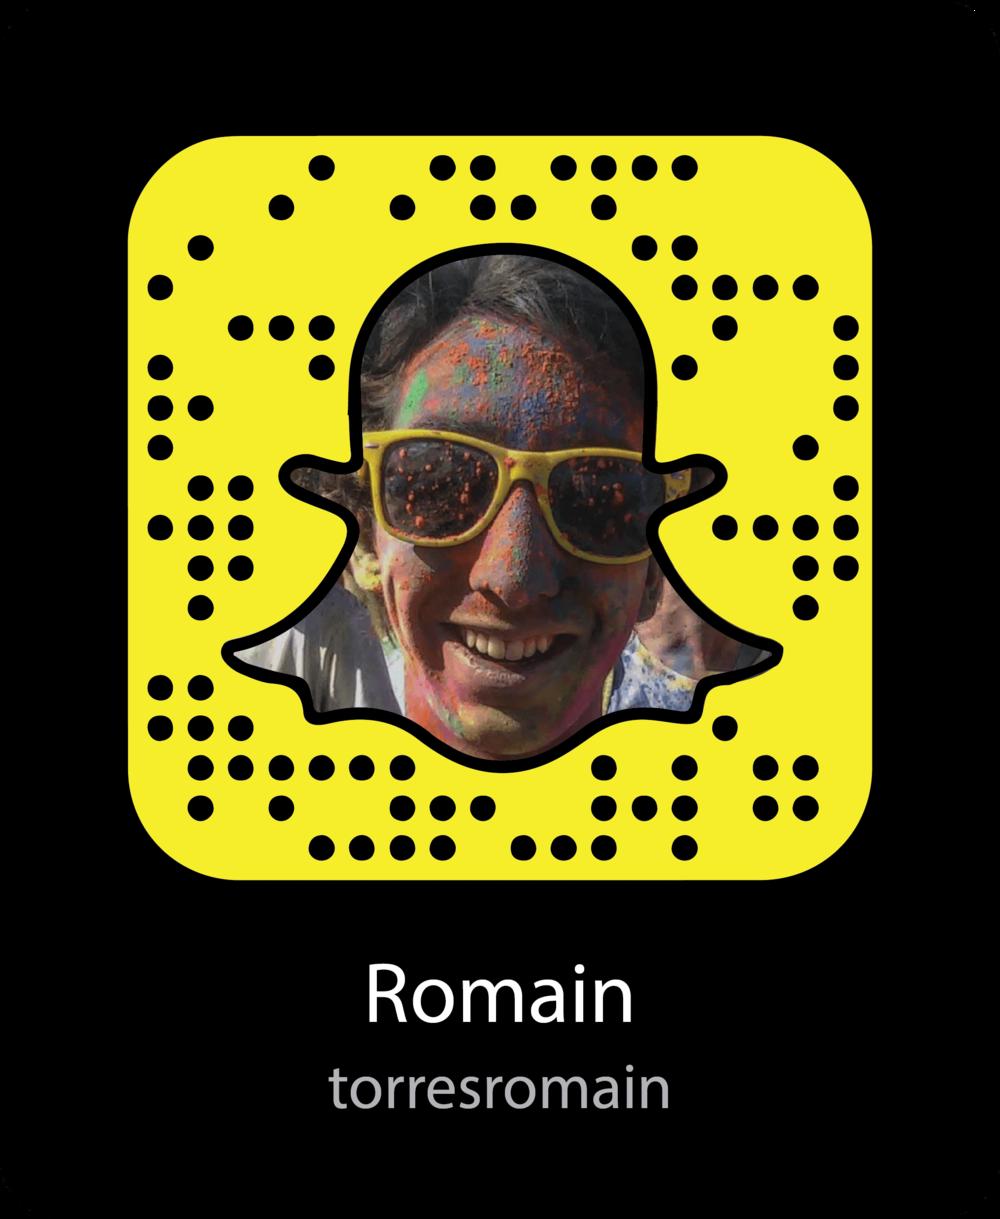 romain-storytellers-snapchat-snapcode.png